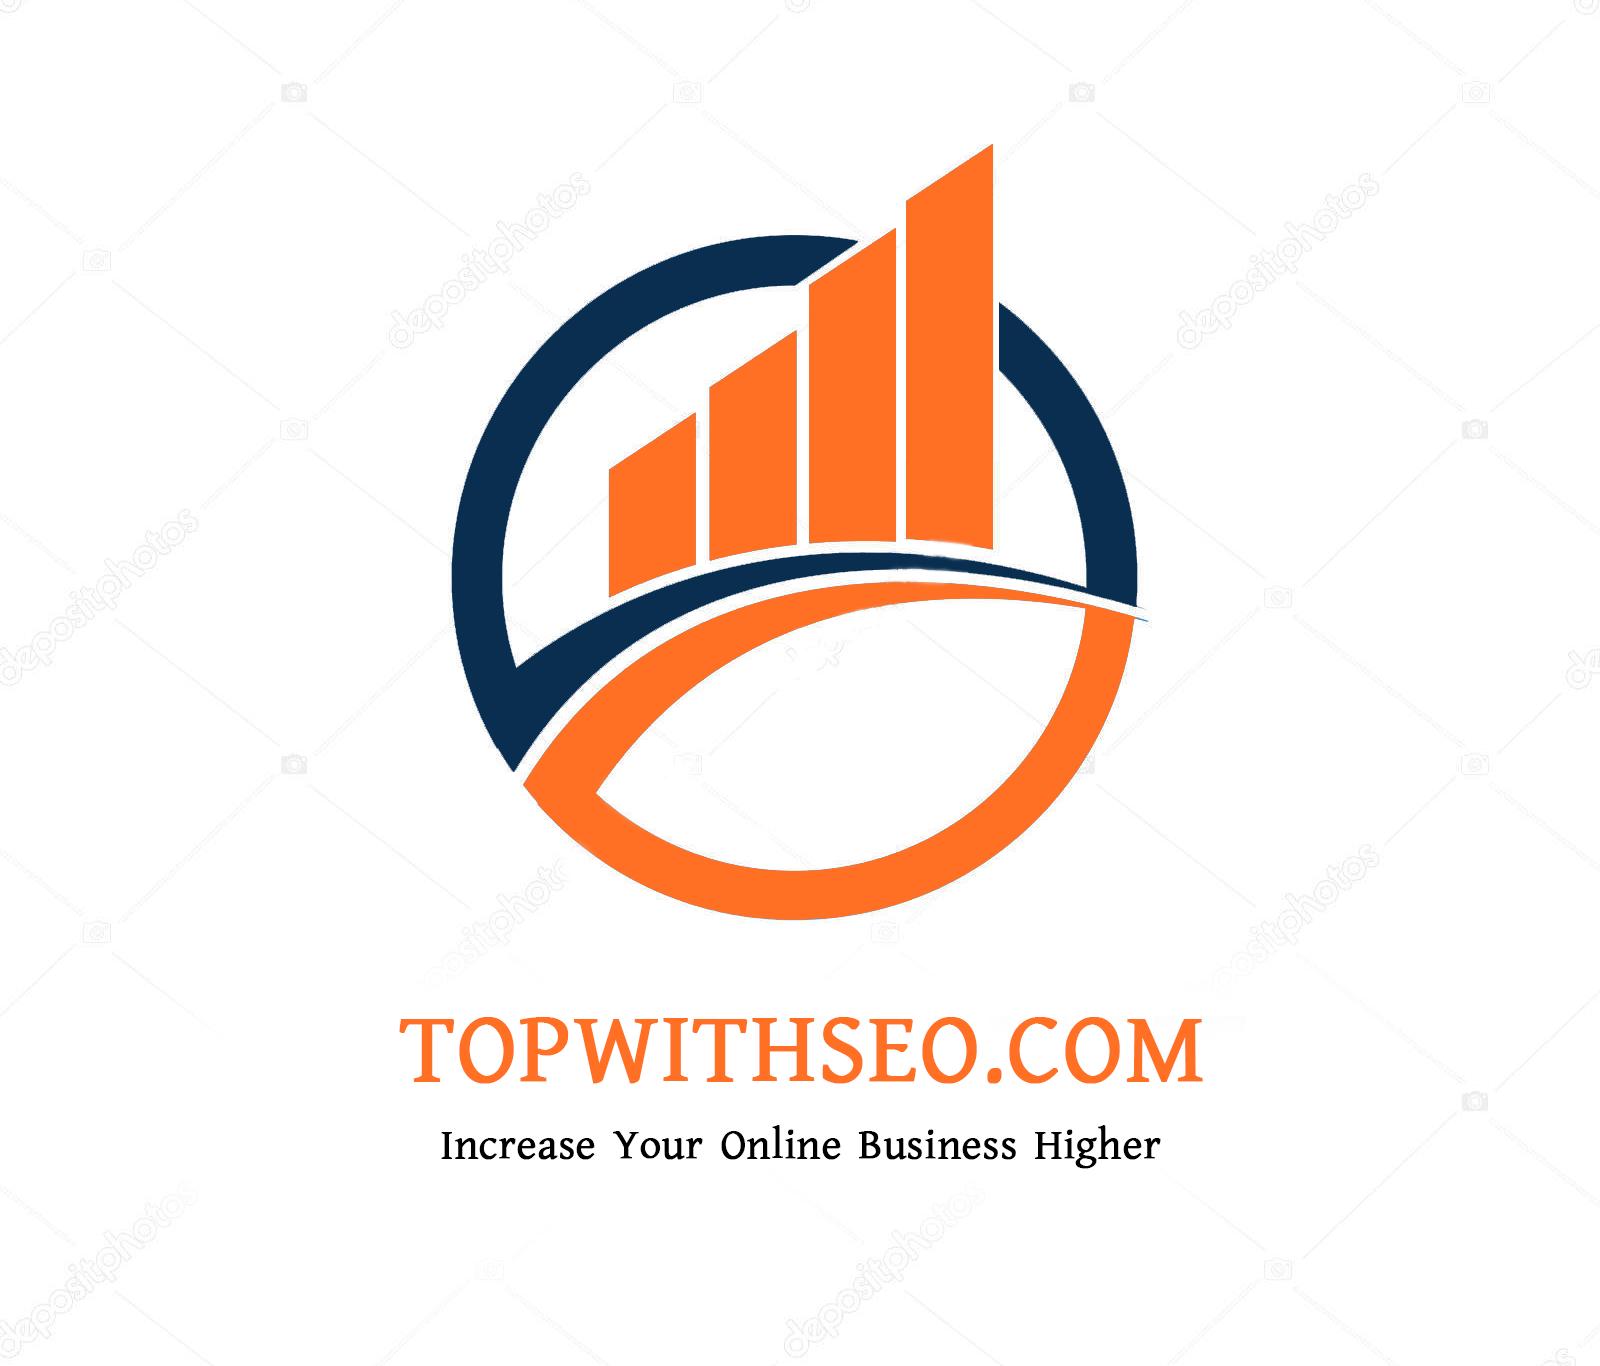 Top With SEO Logo